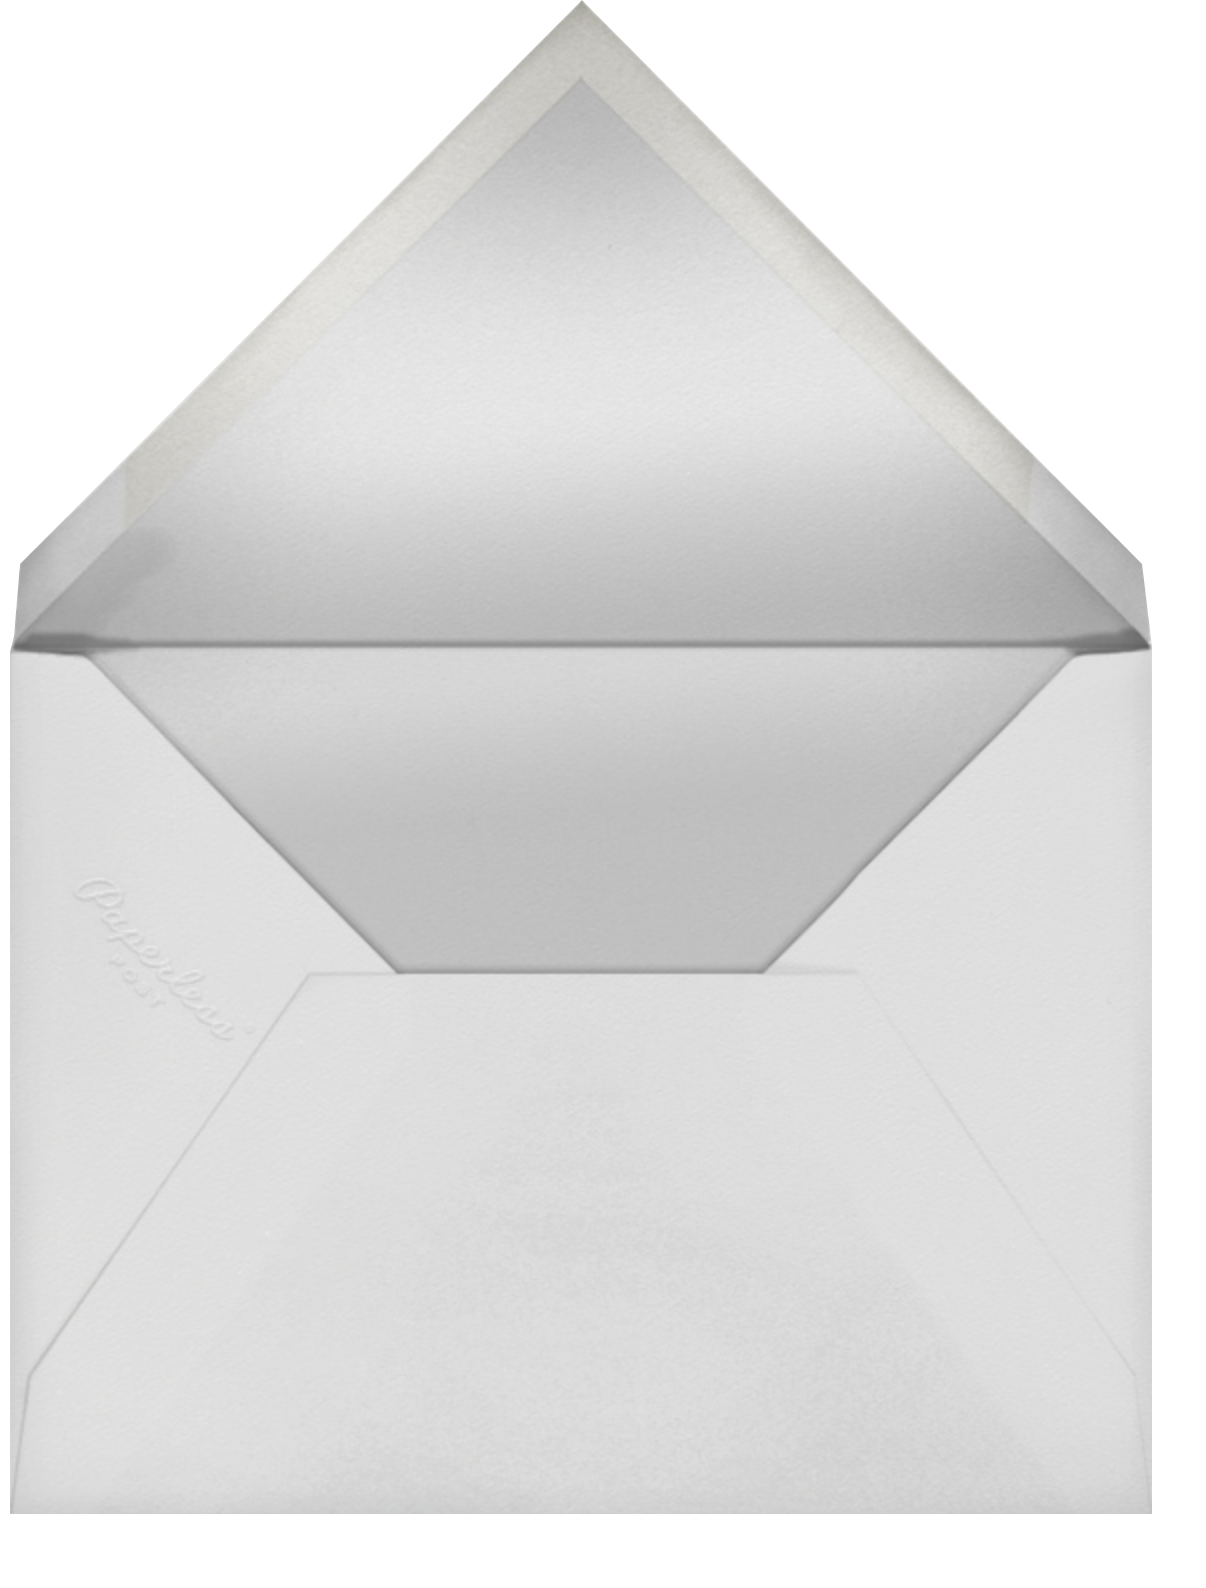 Confetti (Menu) - Navy/Silver - kate spade new york - Envelope